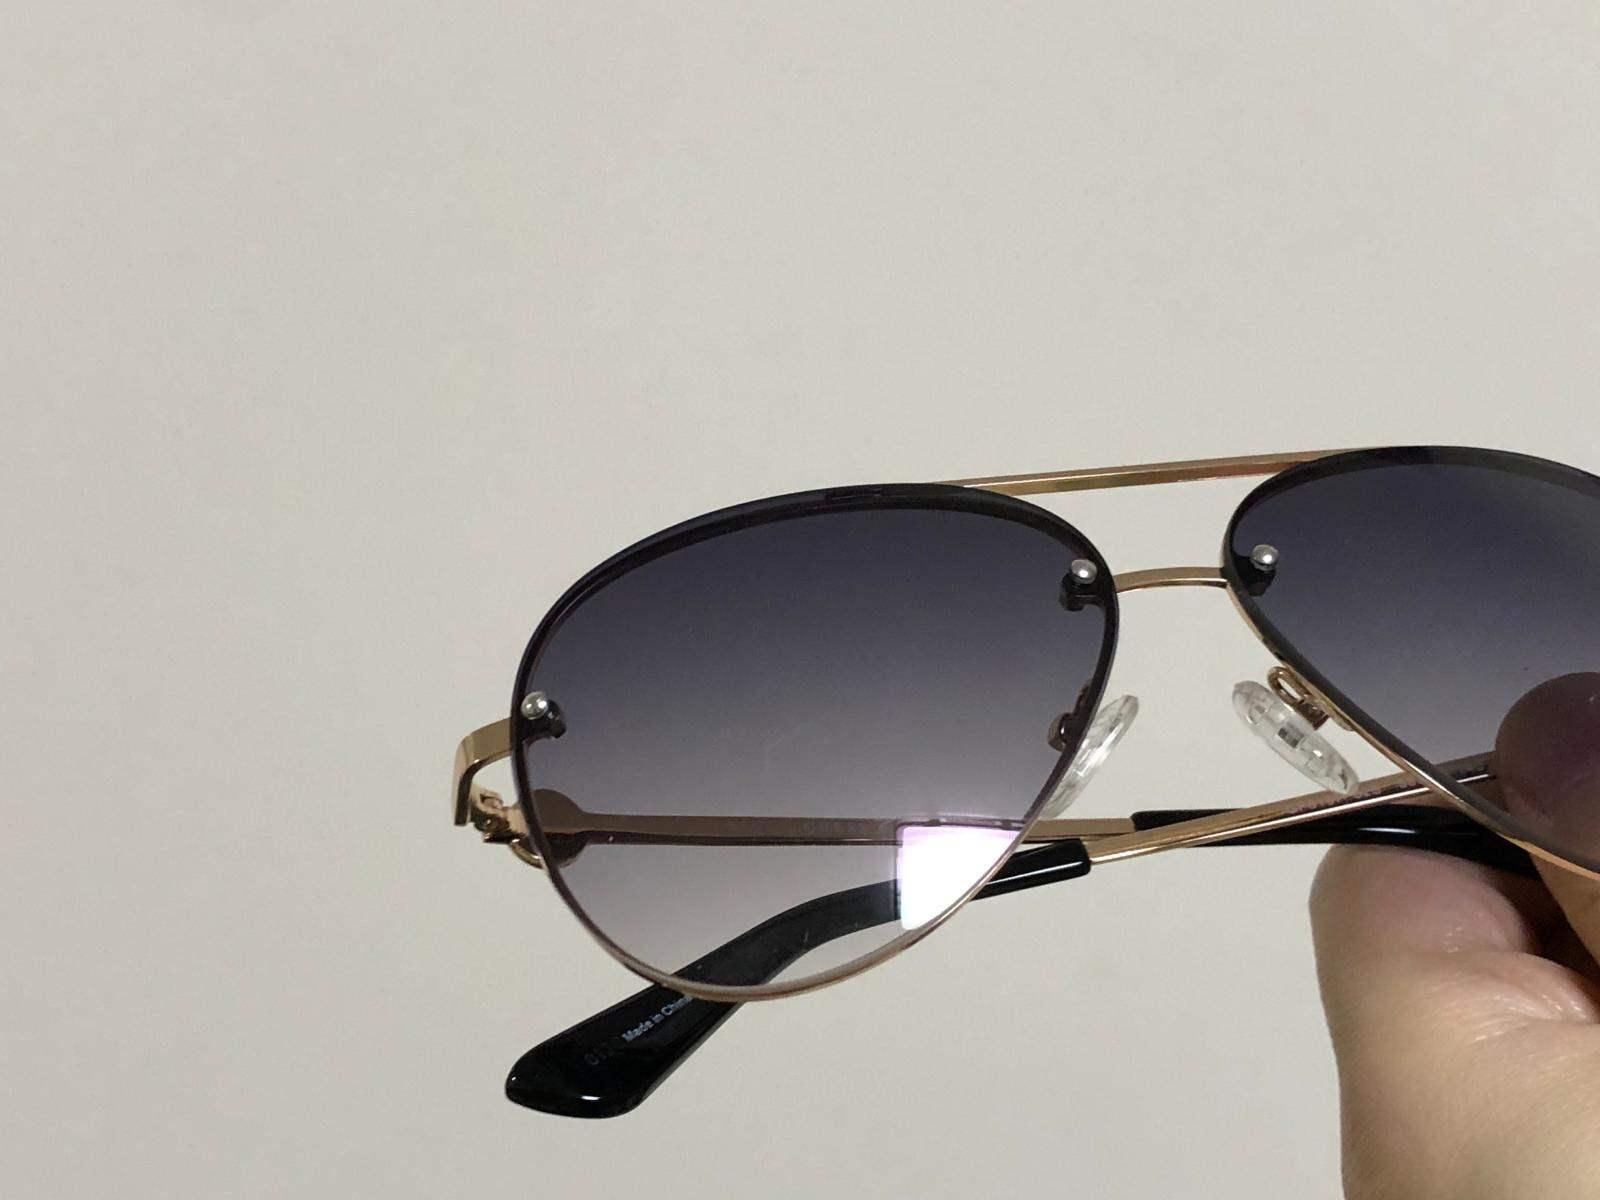 gu 女款镶钻无框太阳眼镜 飞行员款蛤蟆镜墨镜 21年新款 gf6107